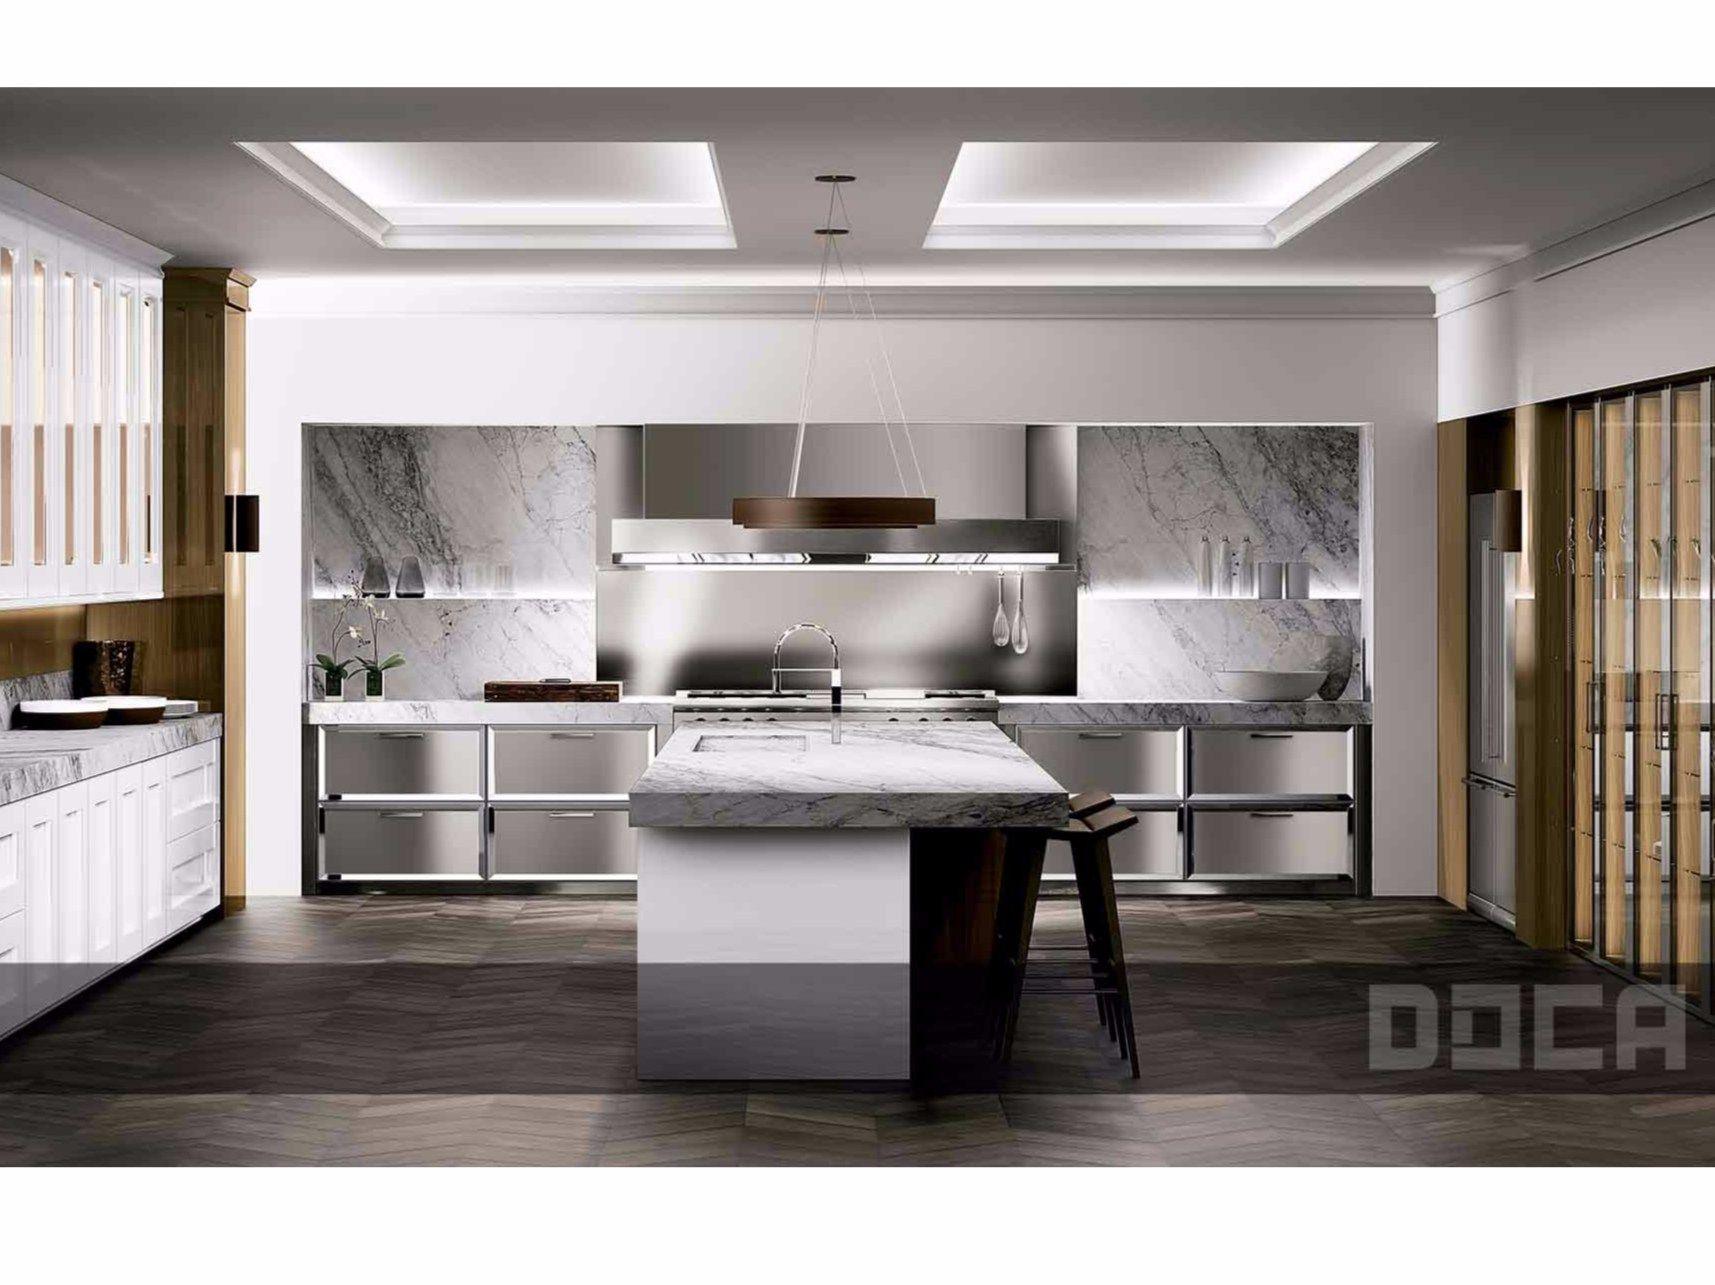 Cucina in stile classico con isola timeless blanco brillo - Isletas de cocina ...